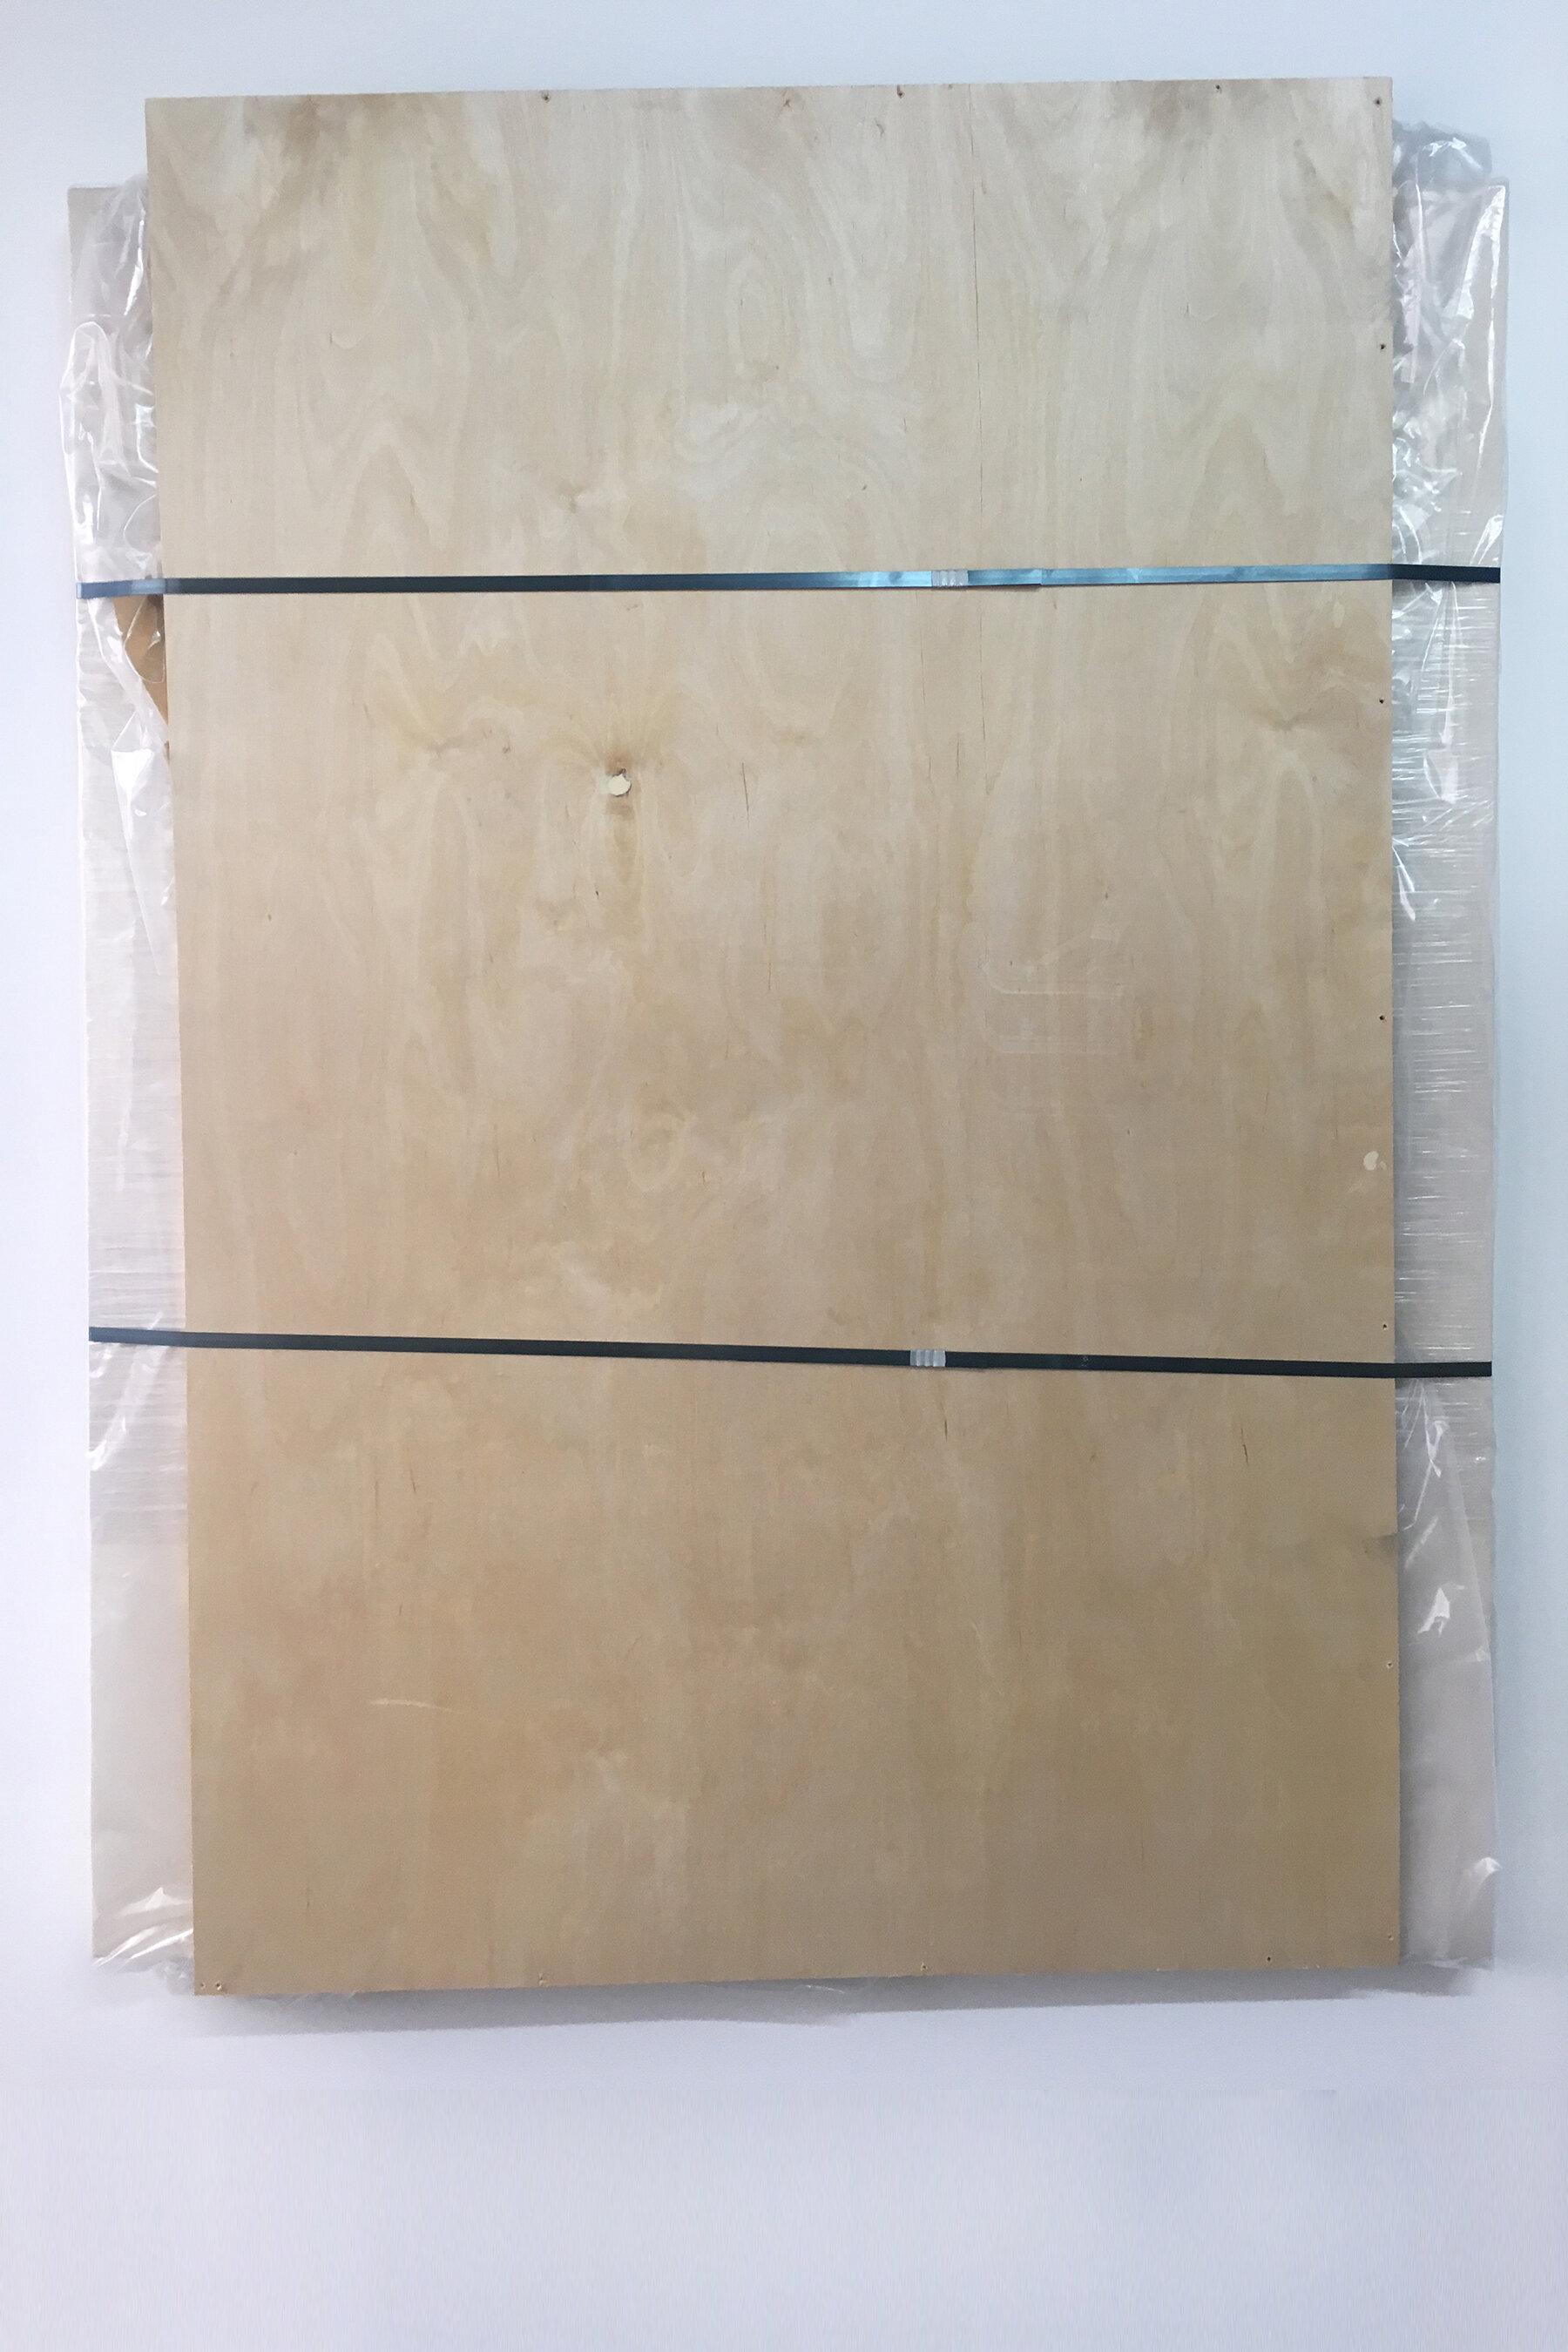 Preserved Paint [10 mL Yellow Ochre, 10 mL Naples Yellow Deep, 10 mL Permanent Red Violet, 10 mL Permanent Red Violet Light, 25 mL Mars Black, 25 mL Titanium White, 40 mL Vermillion, 40 mL Cadmium Yellow Medium, 75 mL Permanent Green Deep, 75 mL Cadmium Red Medium, 100 mL Ultramarine] , 2017, acrylic on canvas over panel, plastic wrap, glass, plastic sheeting, packing tape, wood, steel banding straps, 63 x 48 inches.